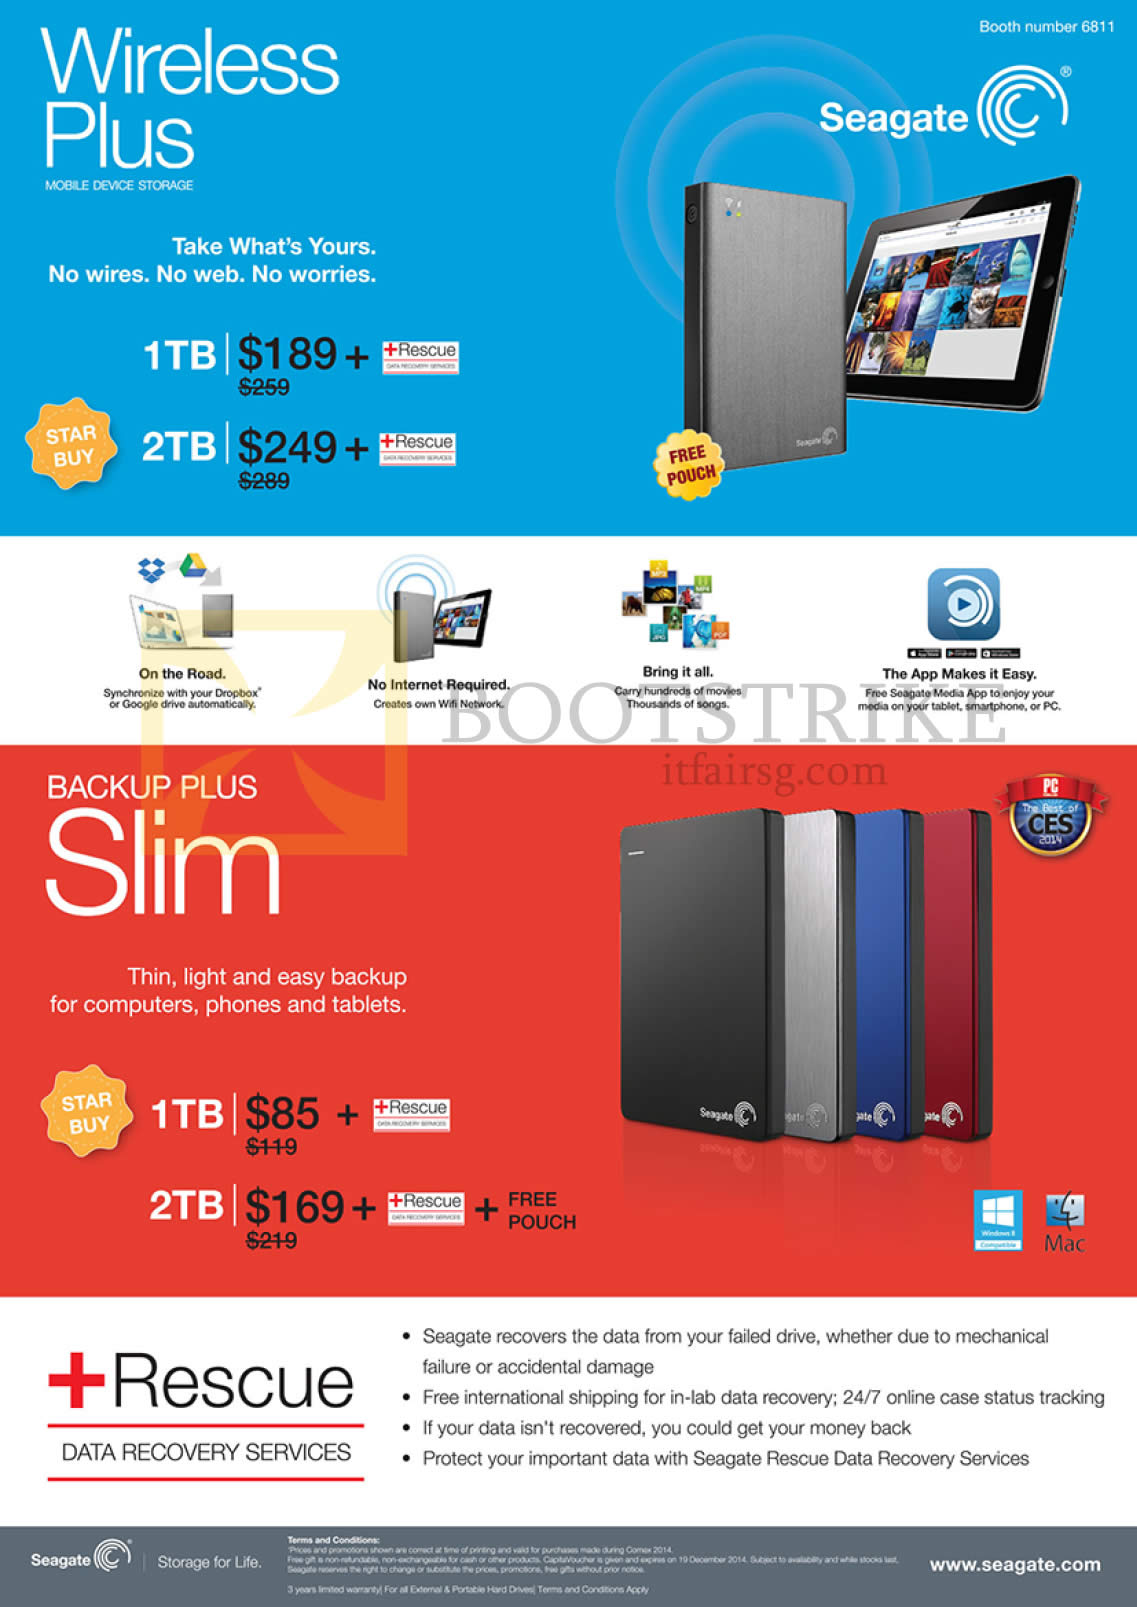 COMEX 2014 price list image brochure of Seagate External Storage Wireless Plus Mobile Device Storage, Backup Plus Slim 1TB, 2TB